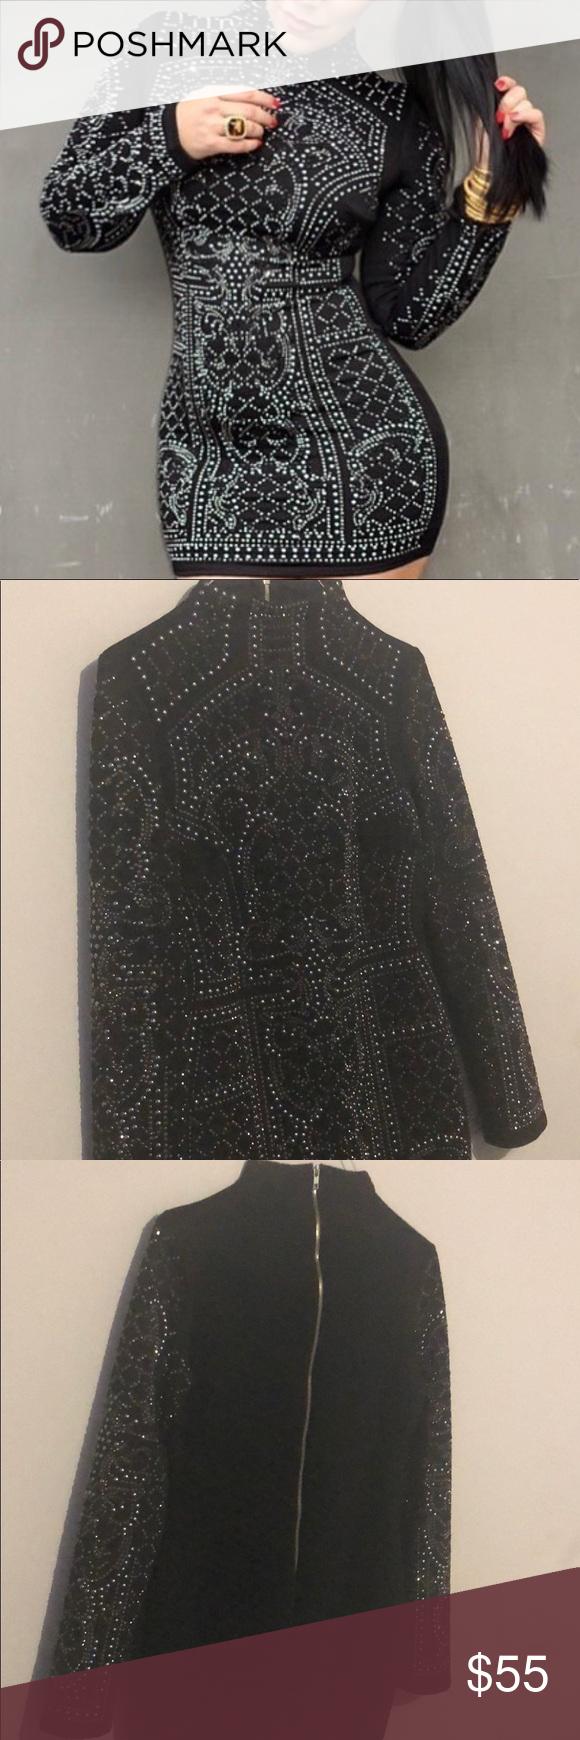 Black diamond embellished stretchy dress boutique my posh closet